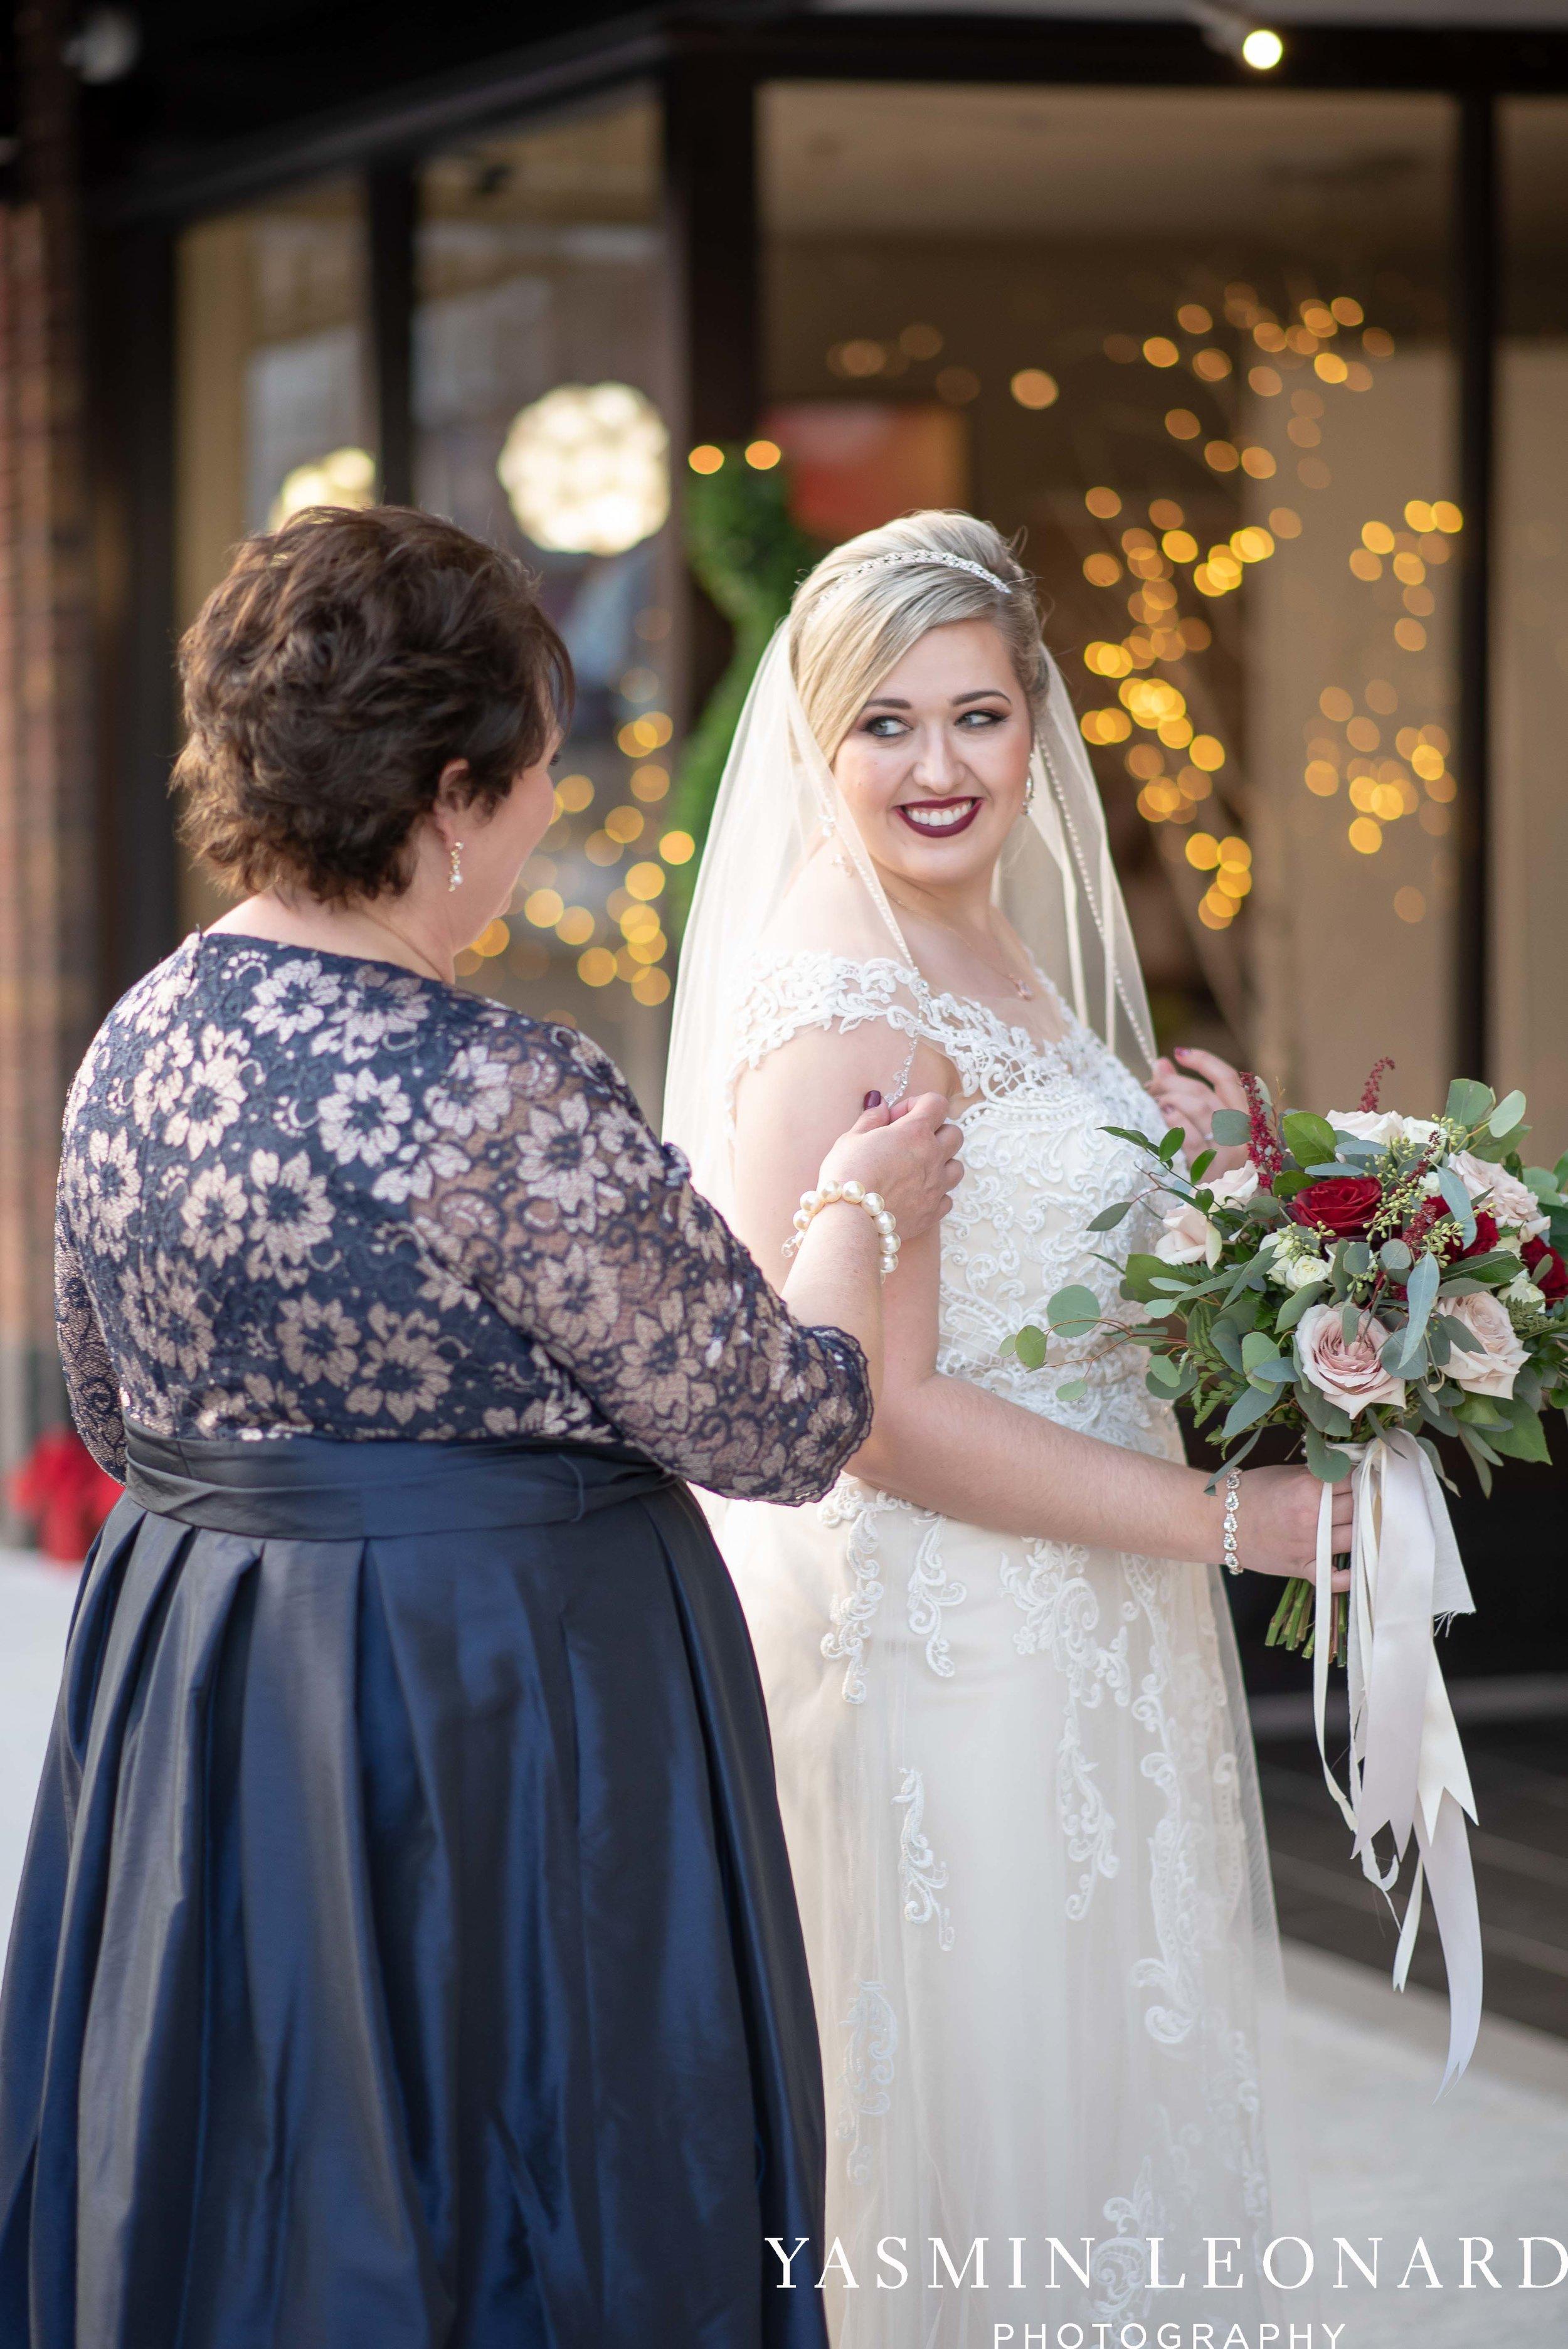 Rebekah and Matt - 105 Worth Event Centre - Yasmin Leonard Photography - Asheboro Wedding - NC Wedding - High Point Weddings - Triad Weddings - Winter Wedding-19.jpg